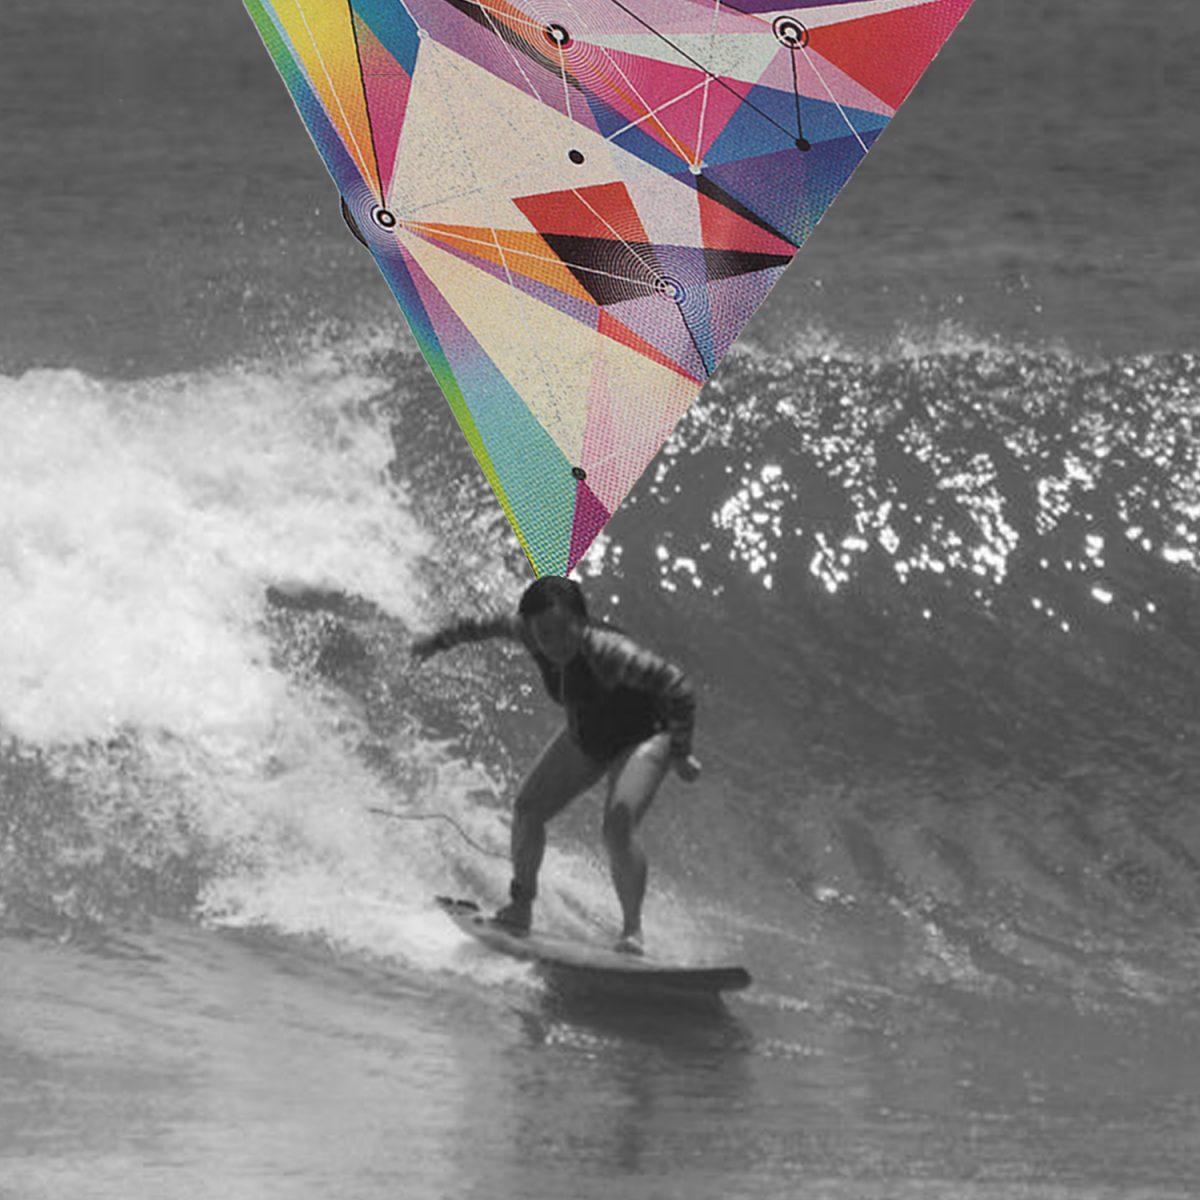 Neurocientista e surfista Elisa Kozasa fala sobre treino mental no surf